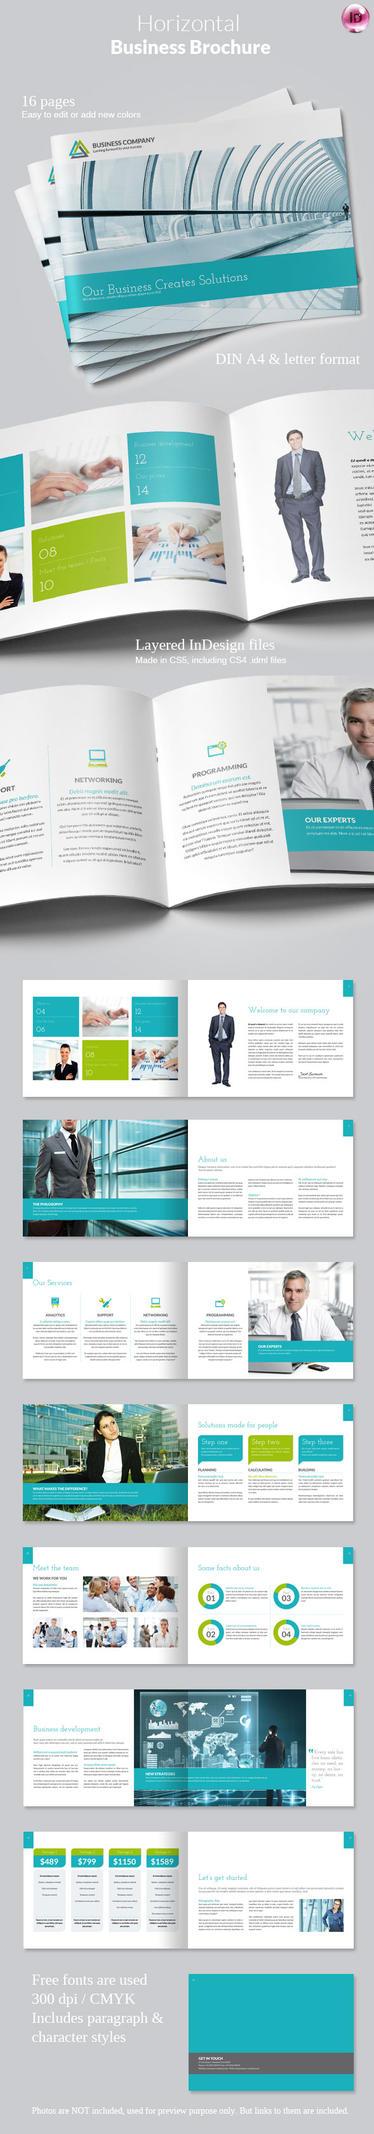 Horizontal business brochure by imagearea on deviantart for Horizontal brochure design